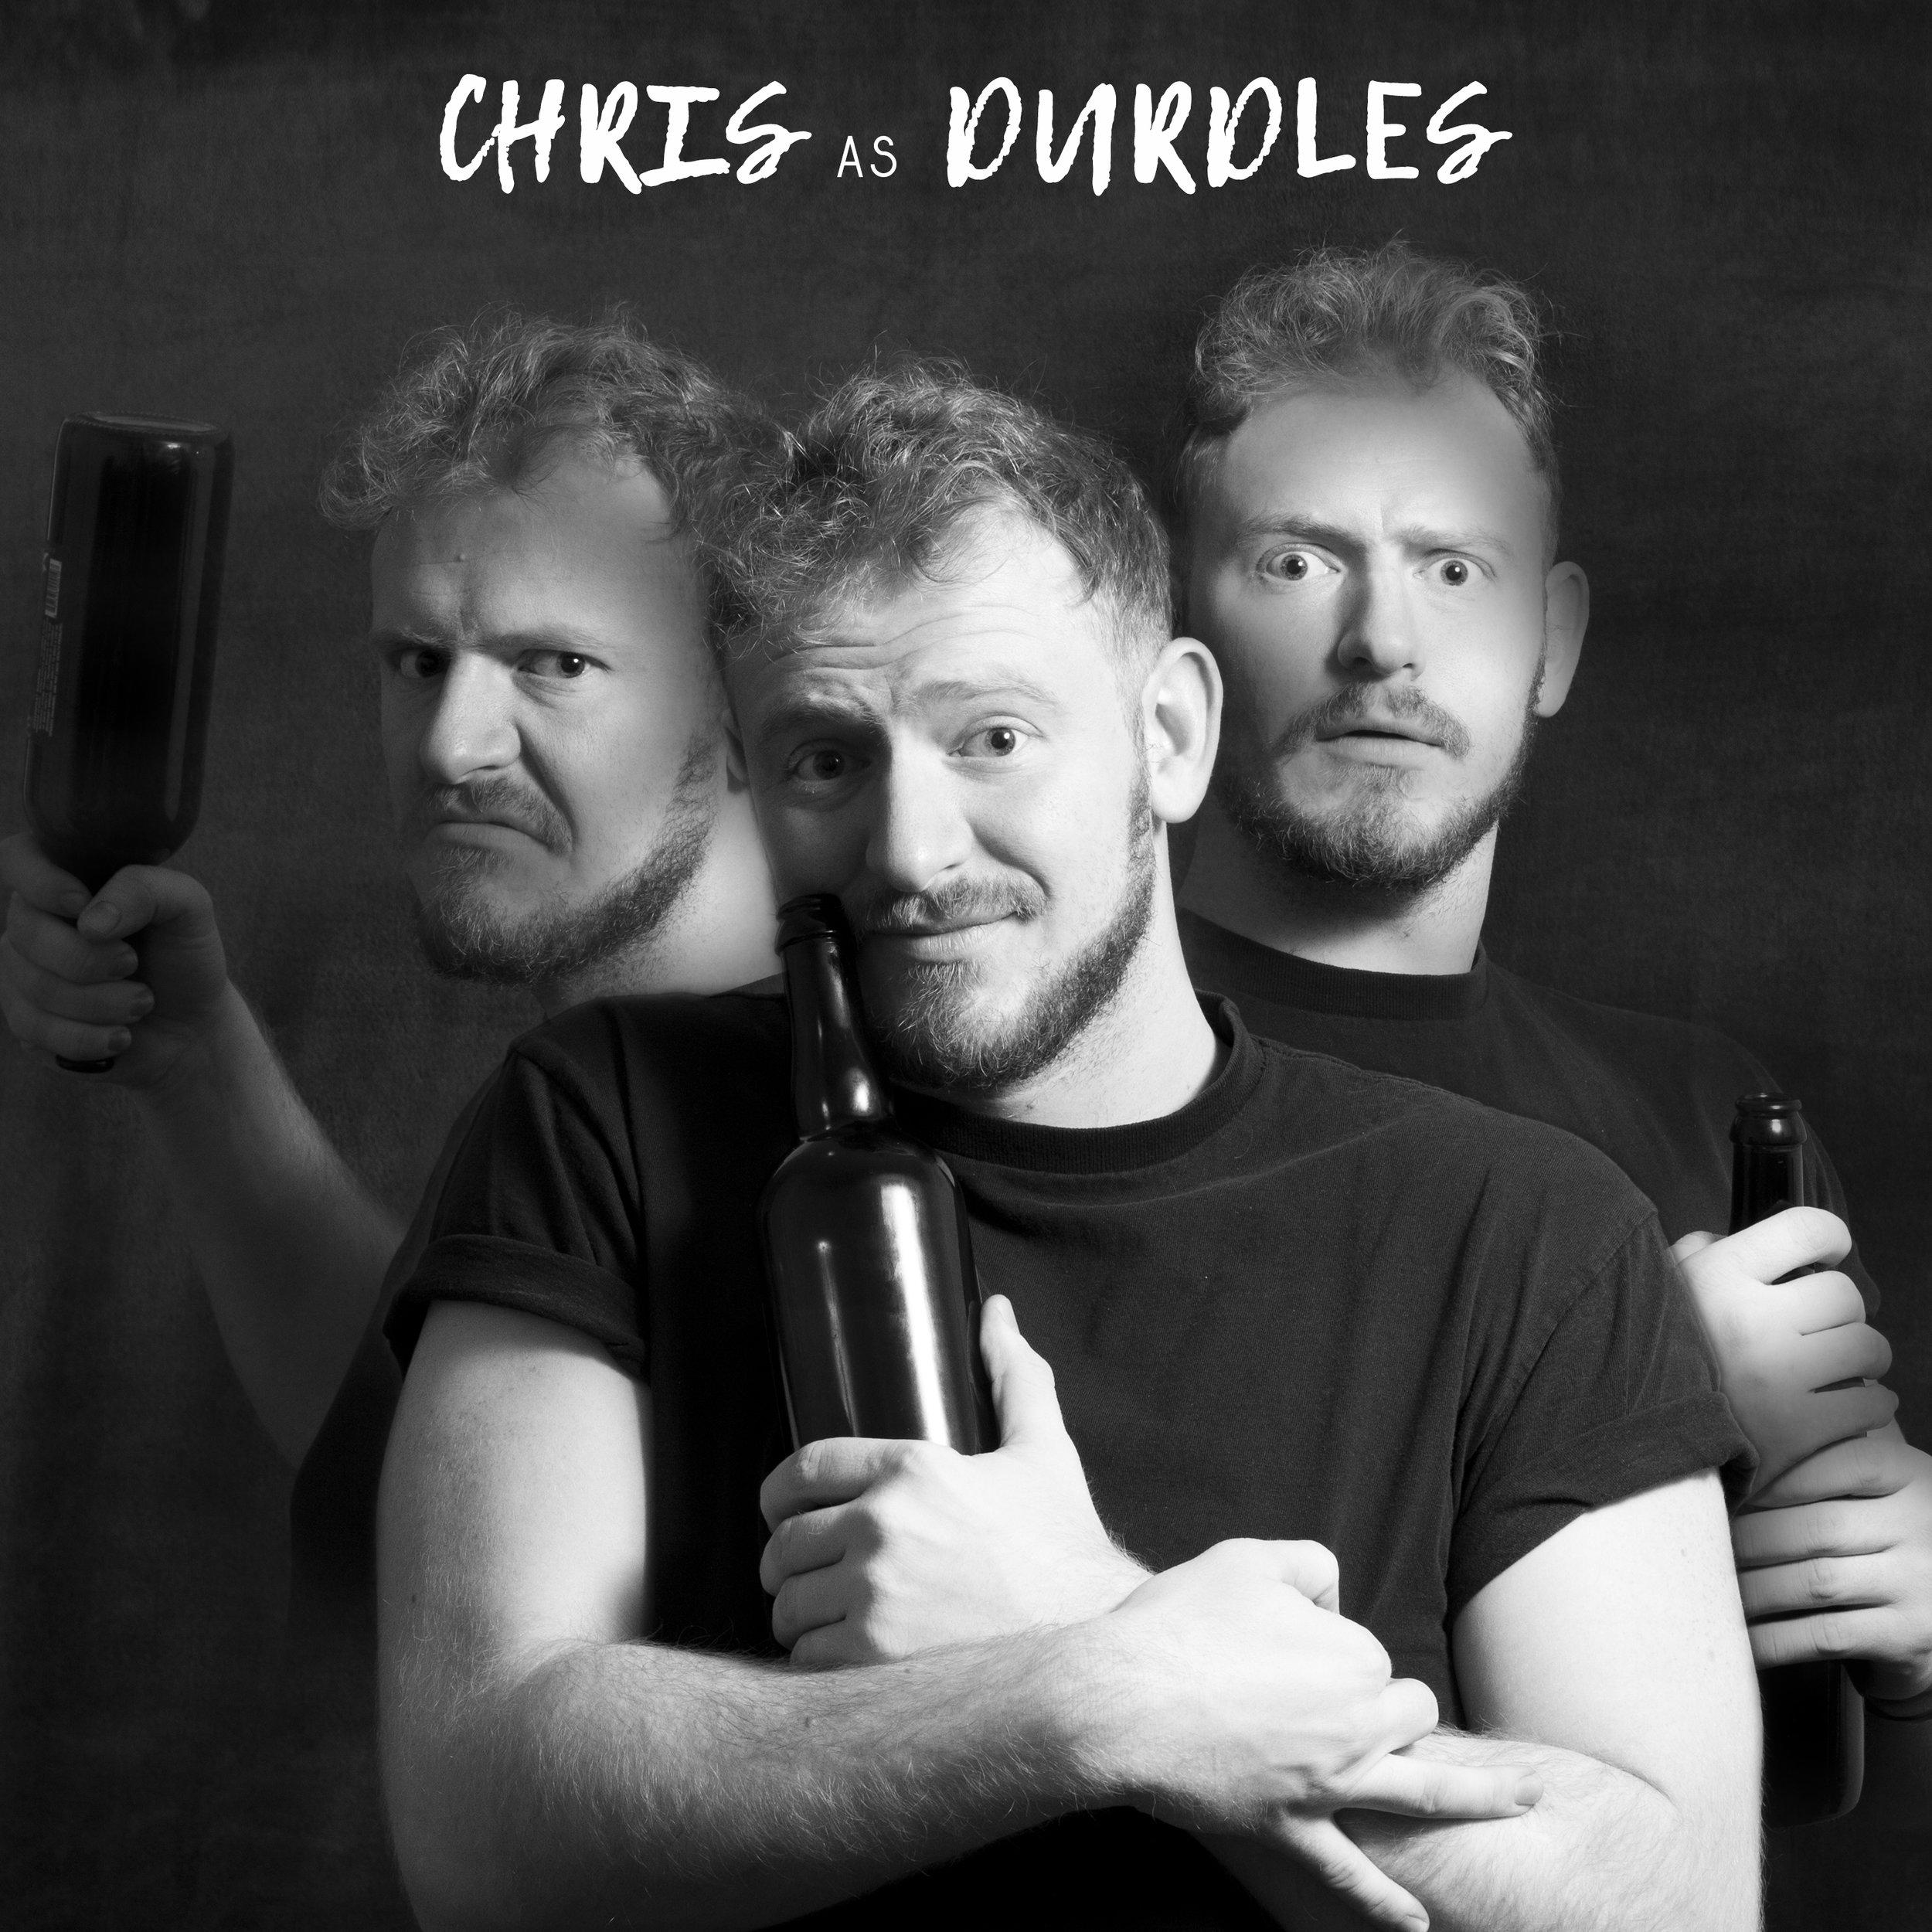 durdles.jpg